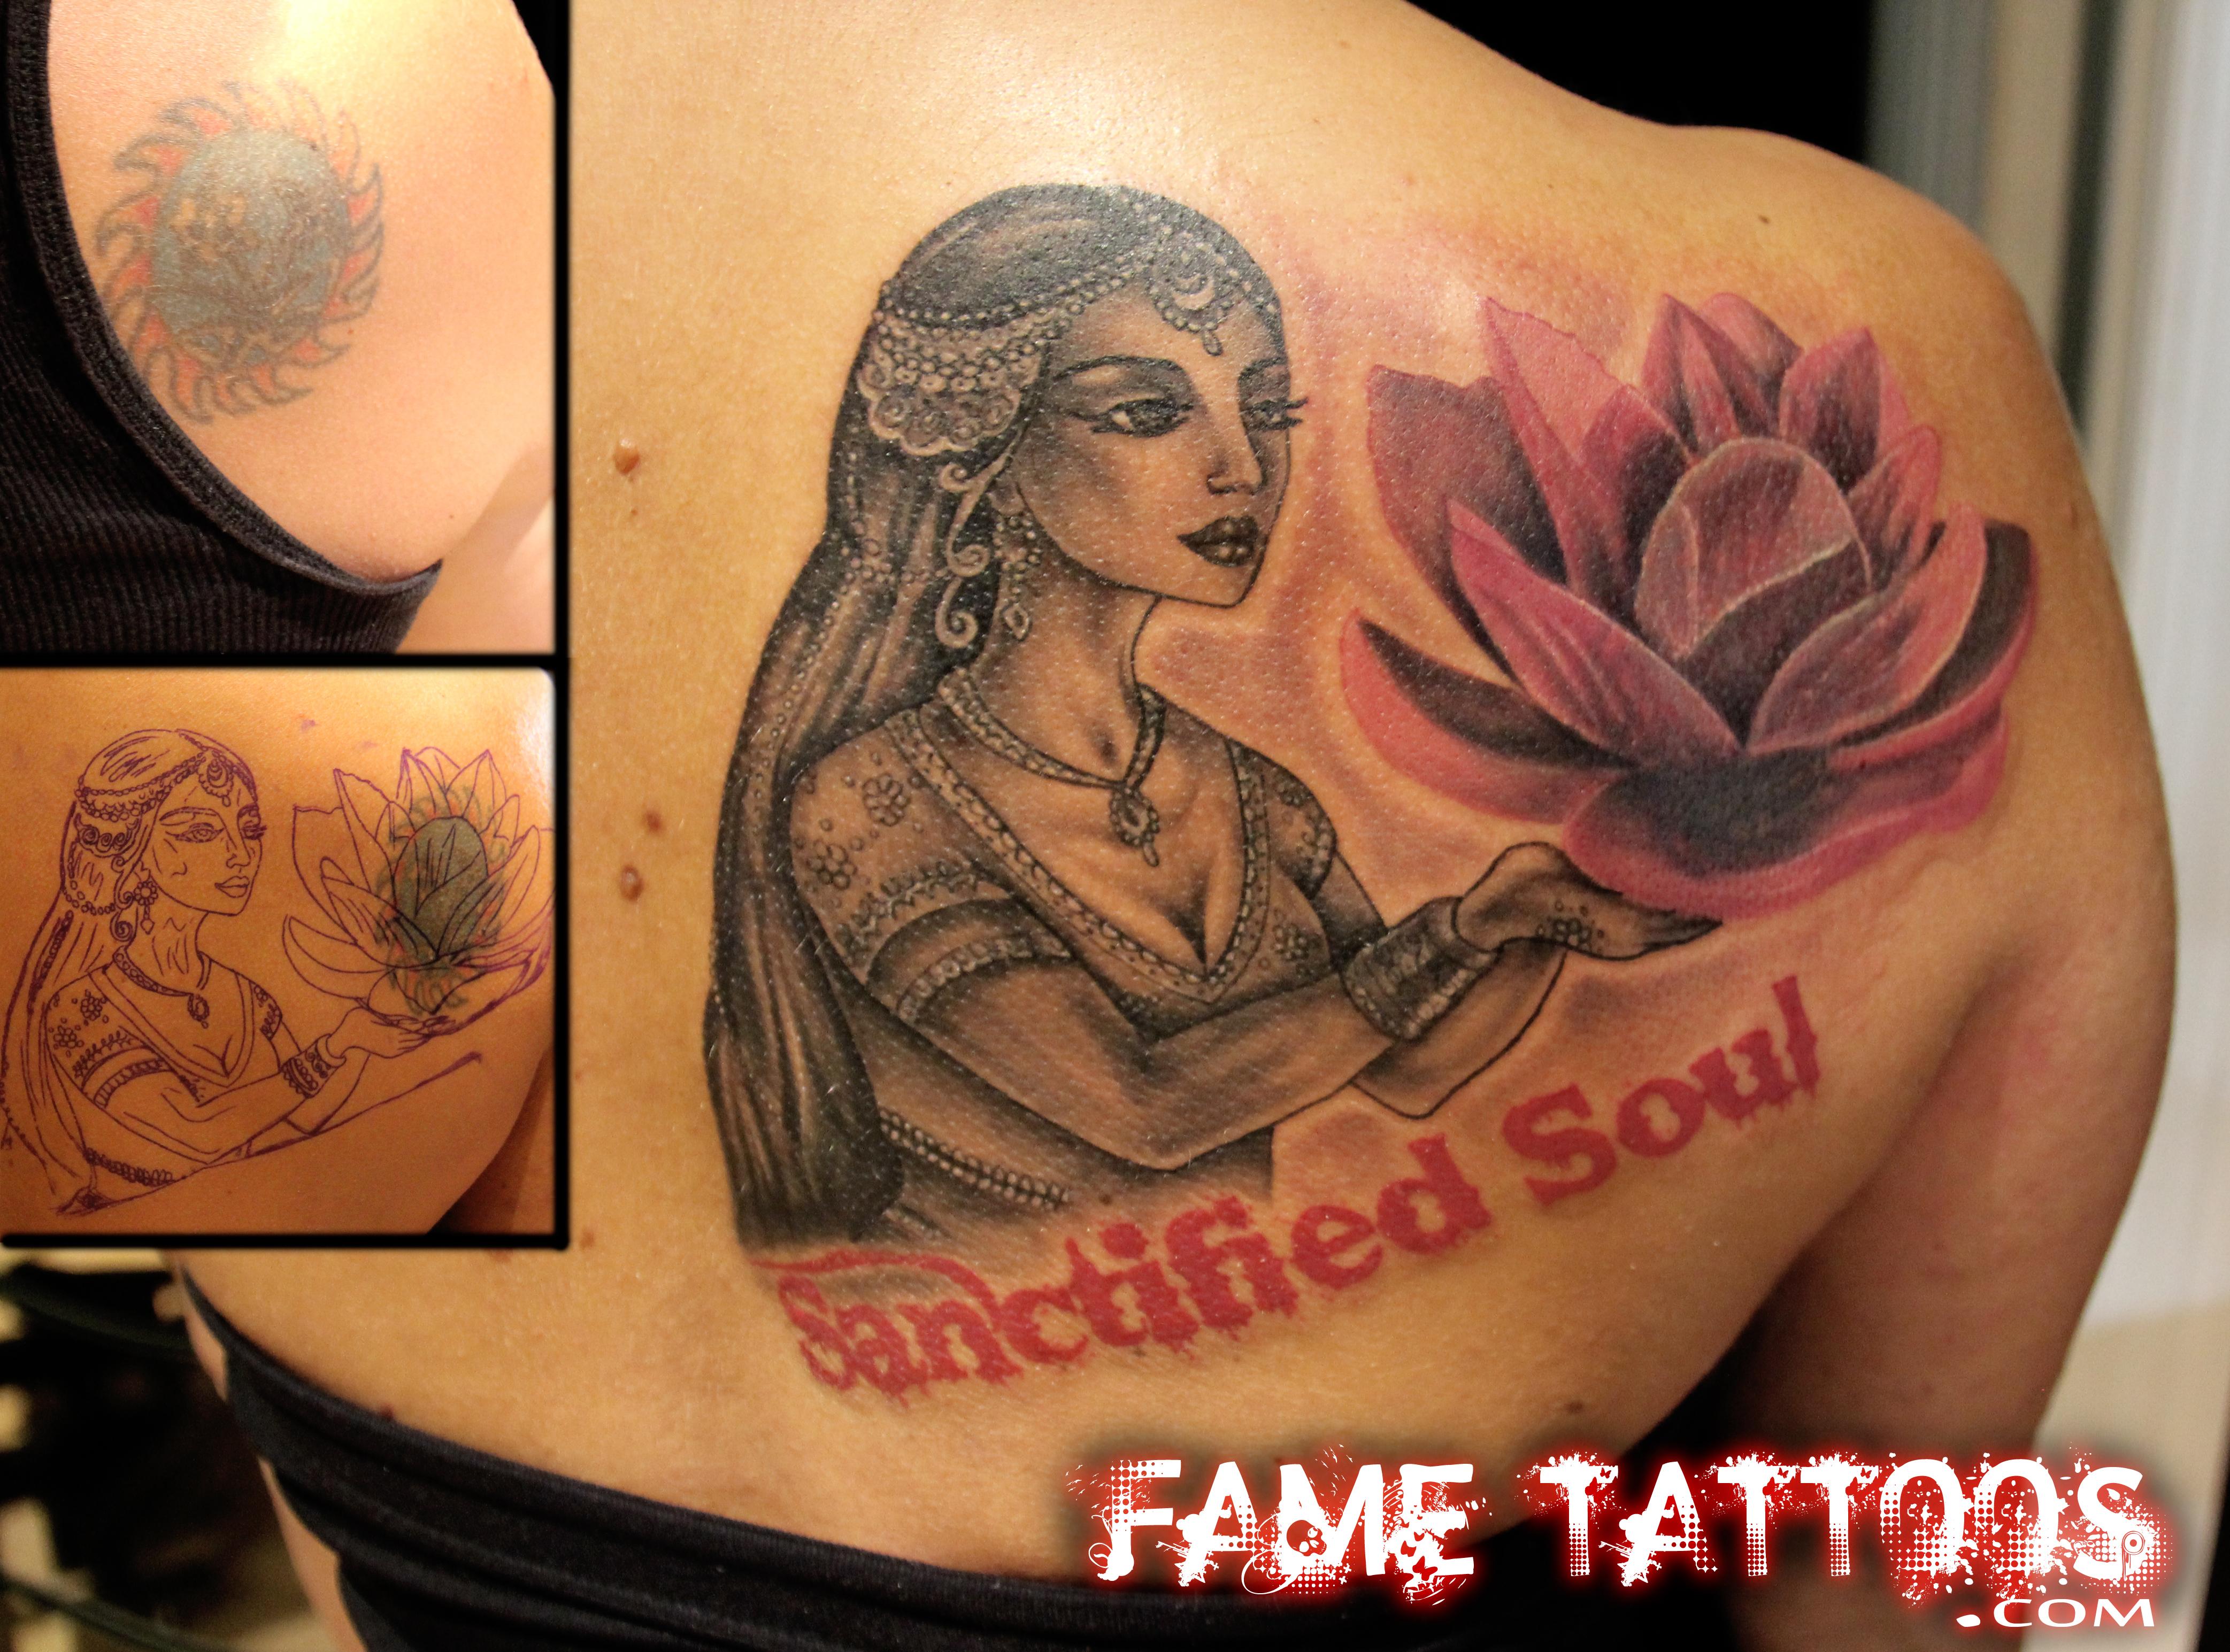 13 best cover up tattoo artist pricipessa s tattoo for Best cover up tattoo artist